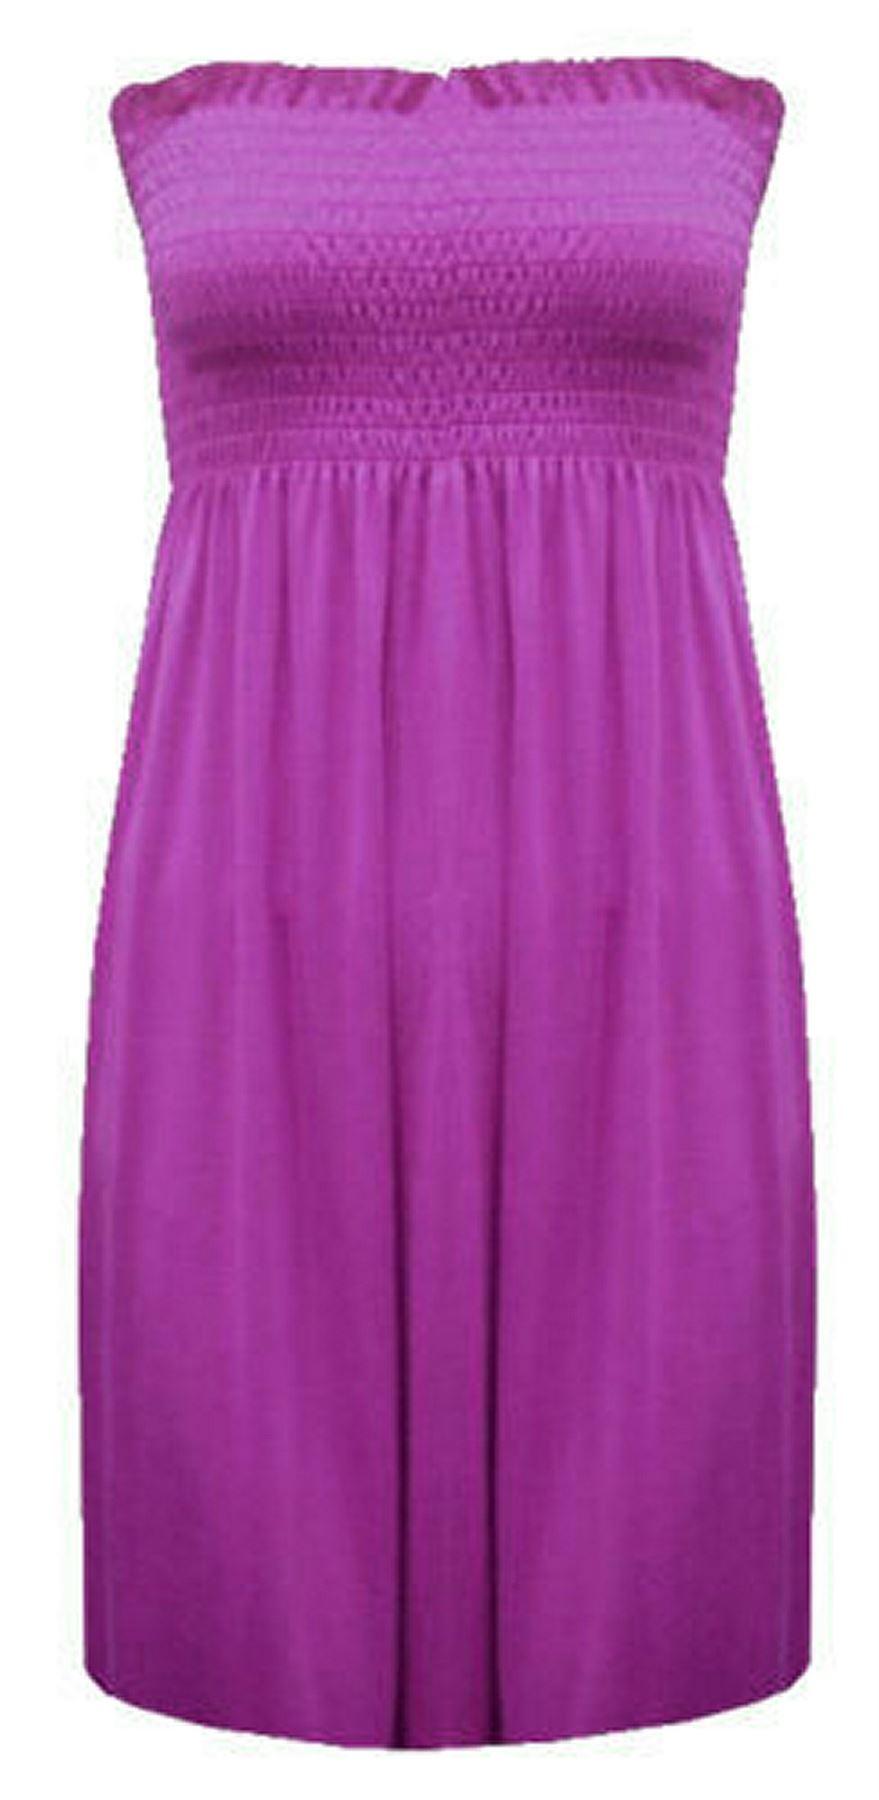 New-Ladies-Bandeau-Boob-Gathering-Tops-Boob-Tube-Beach-Wear-Tunics-8-26 thumbnail 54